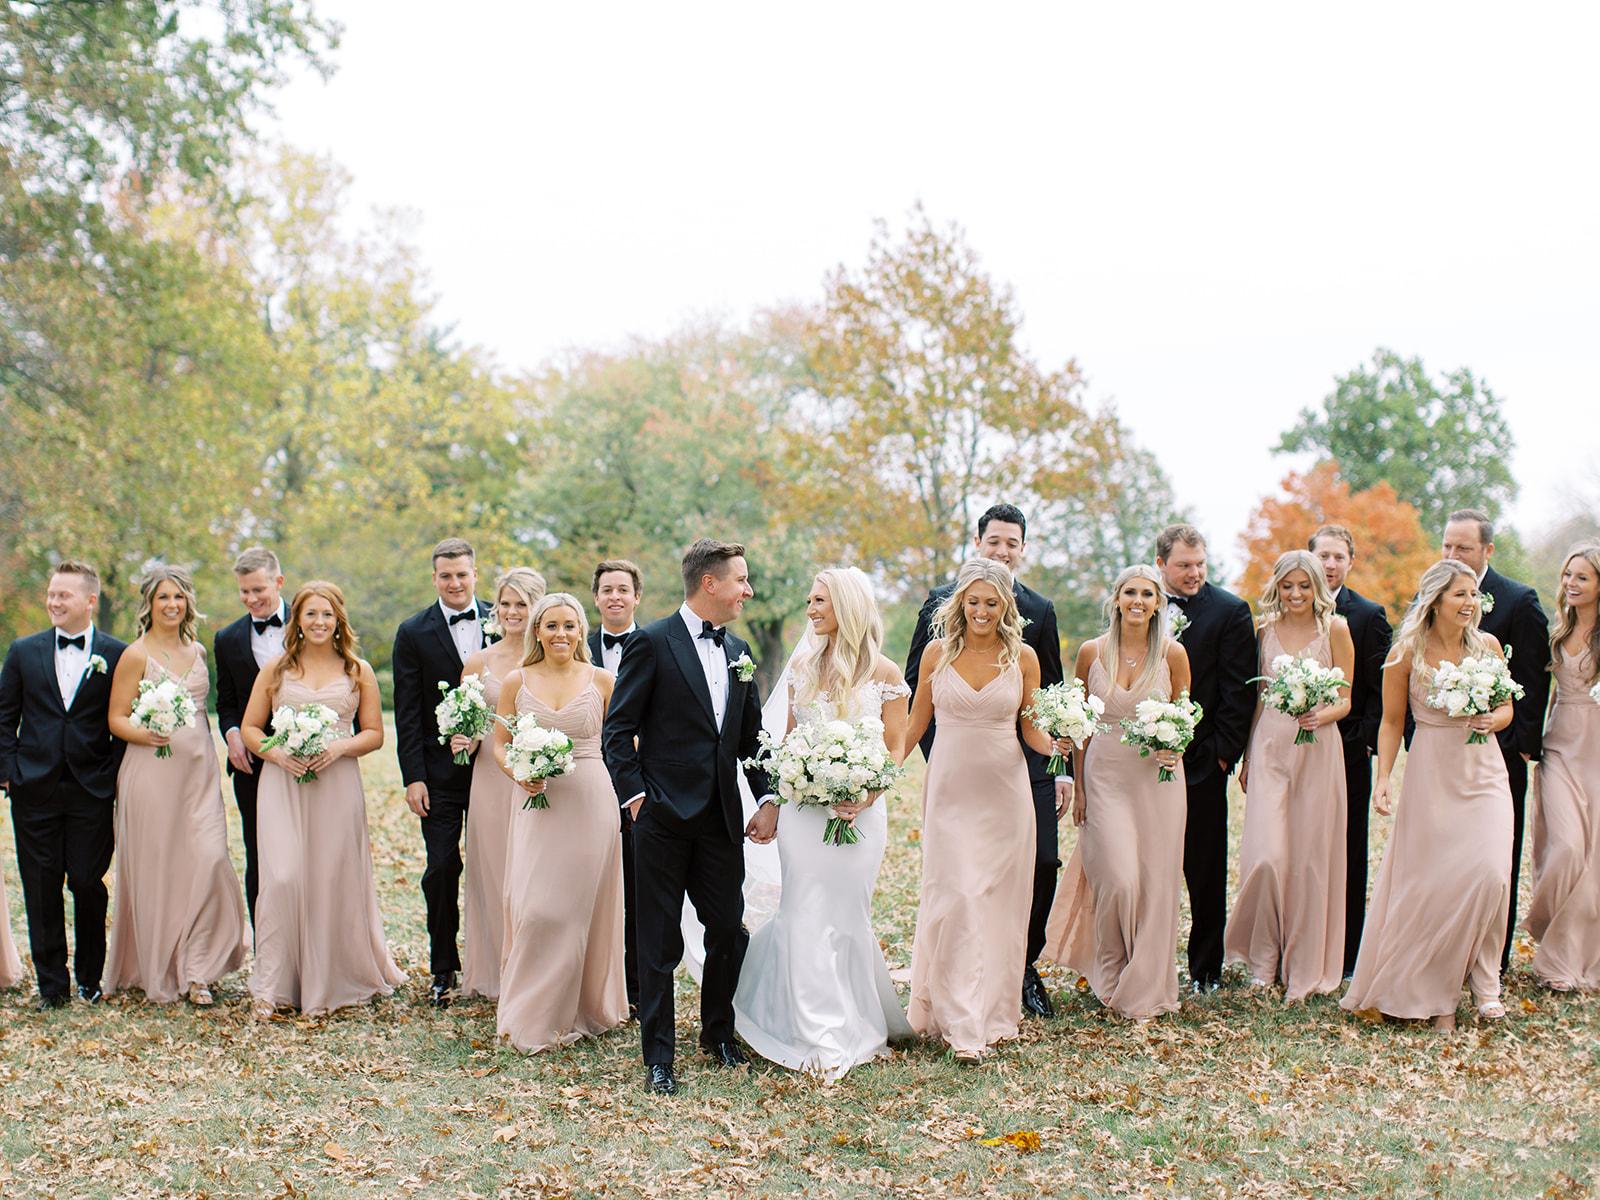 Bridal party walking together at Ritz Charles wedding